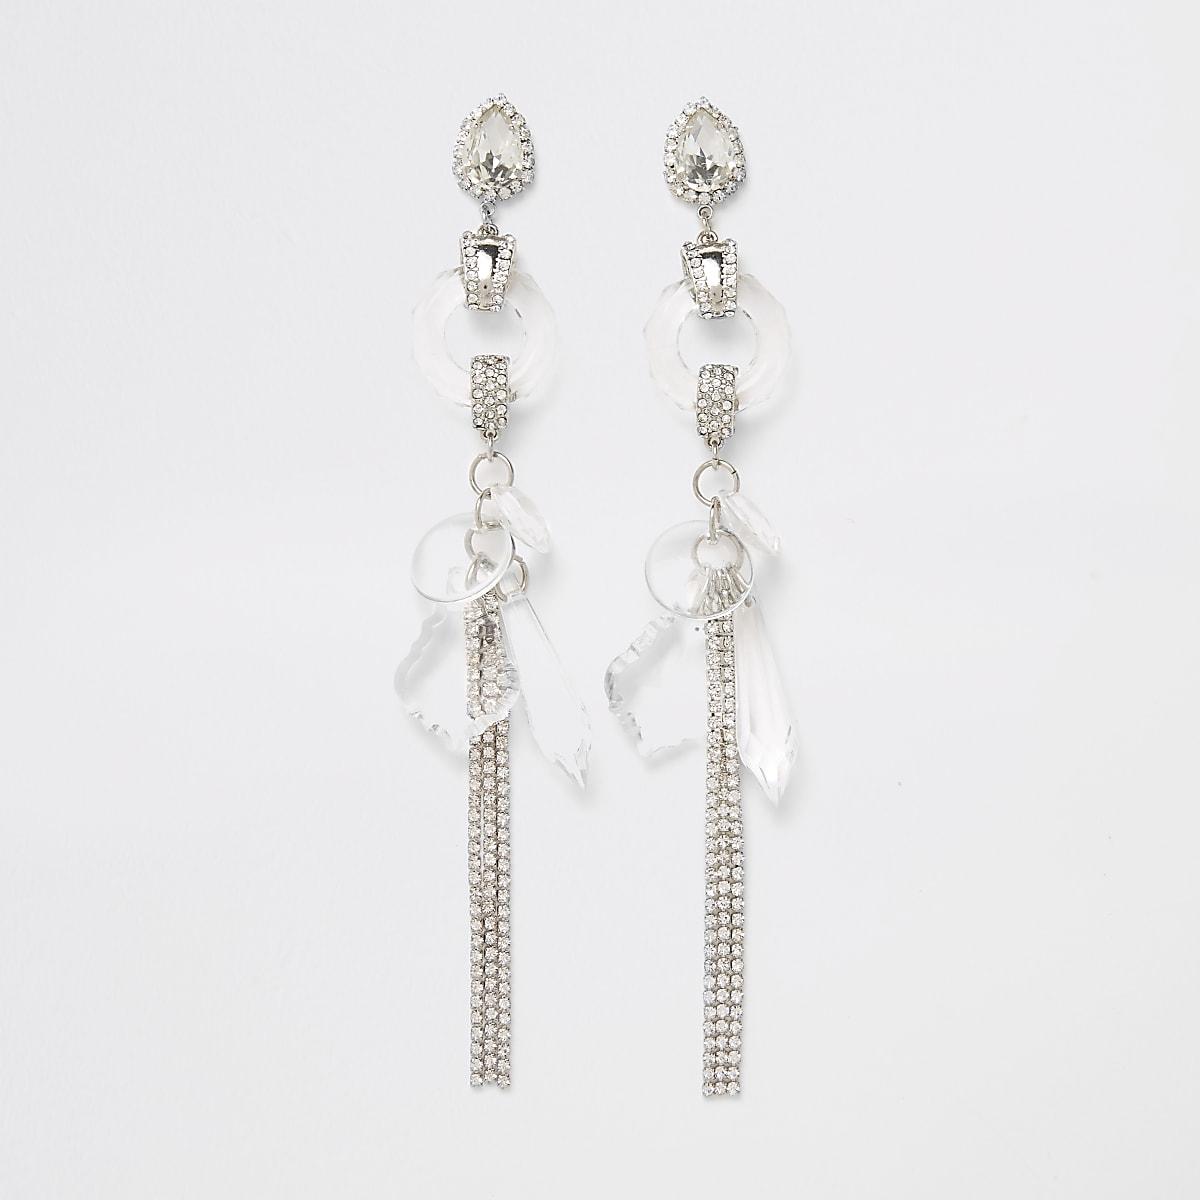 Silver tone rhinestone and jewel drop earrings